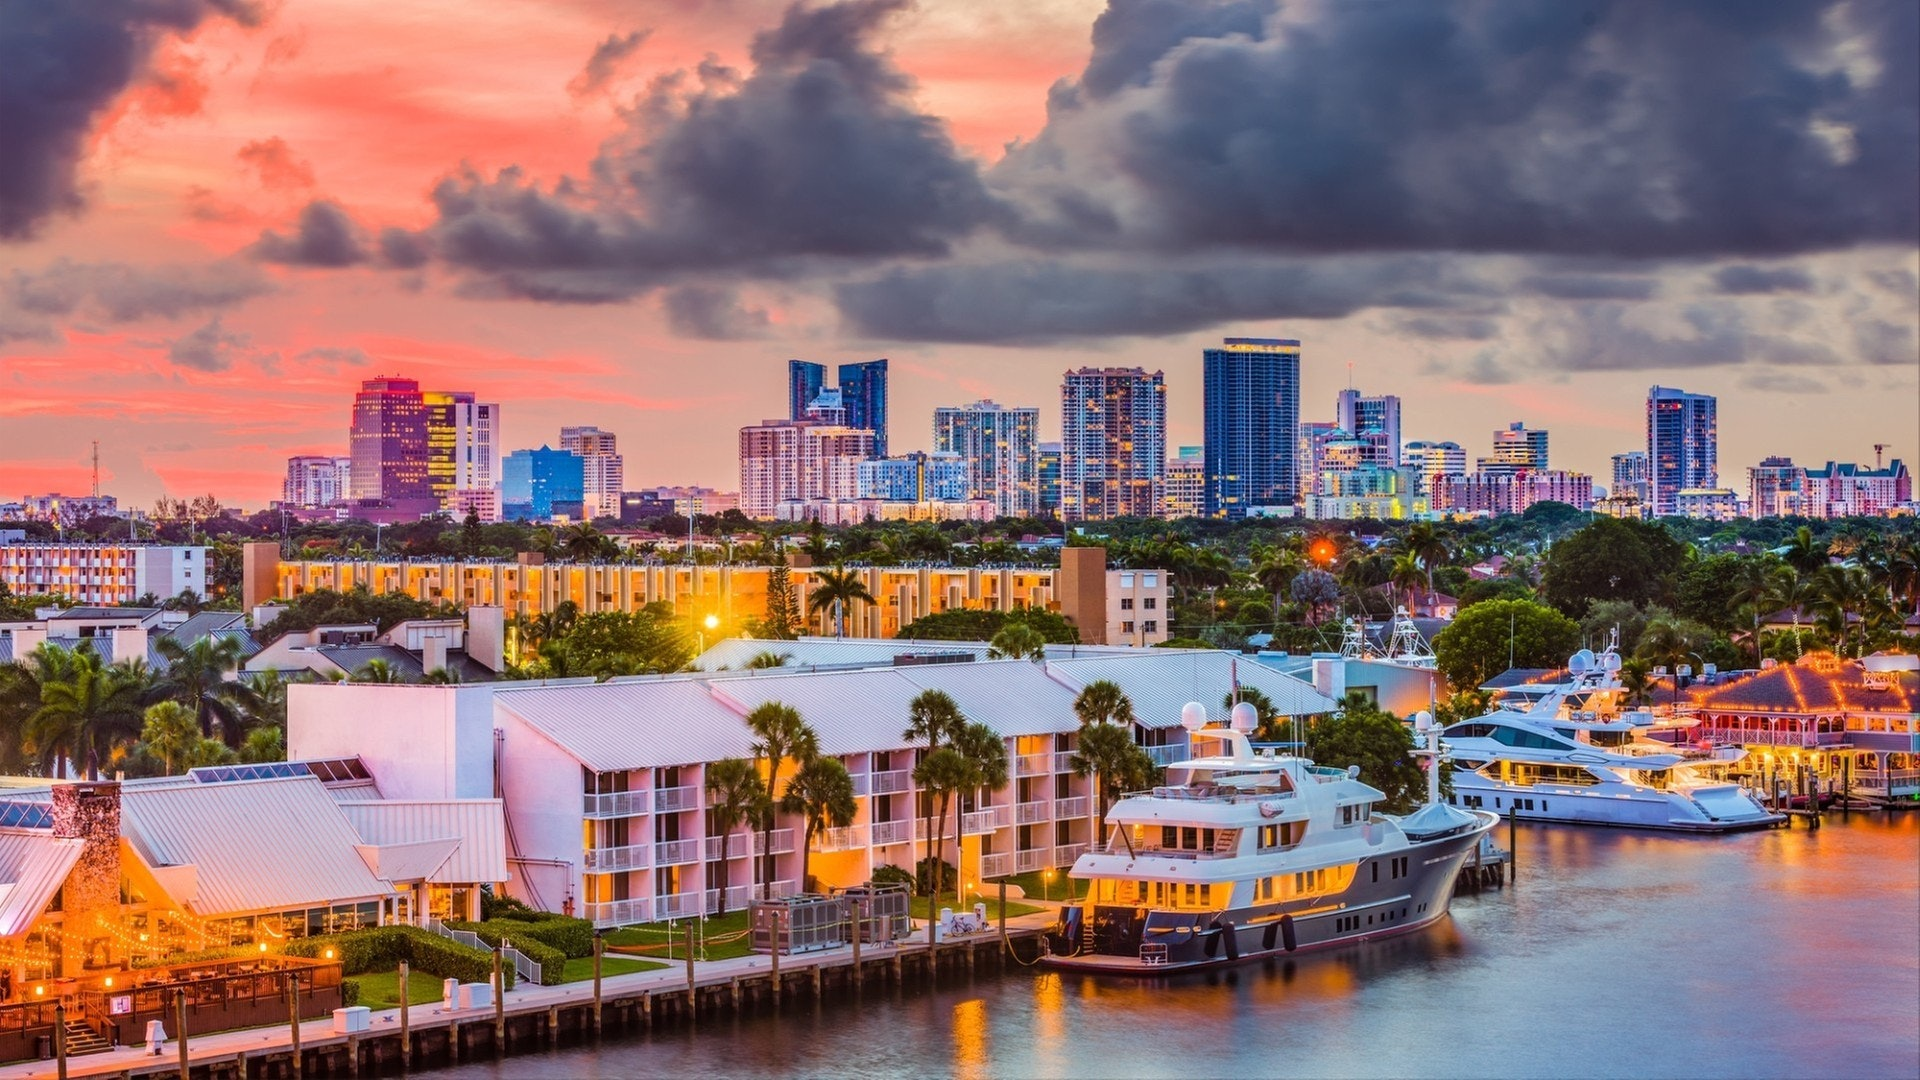 Florida - East Coast